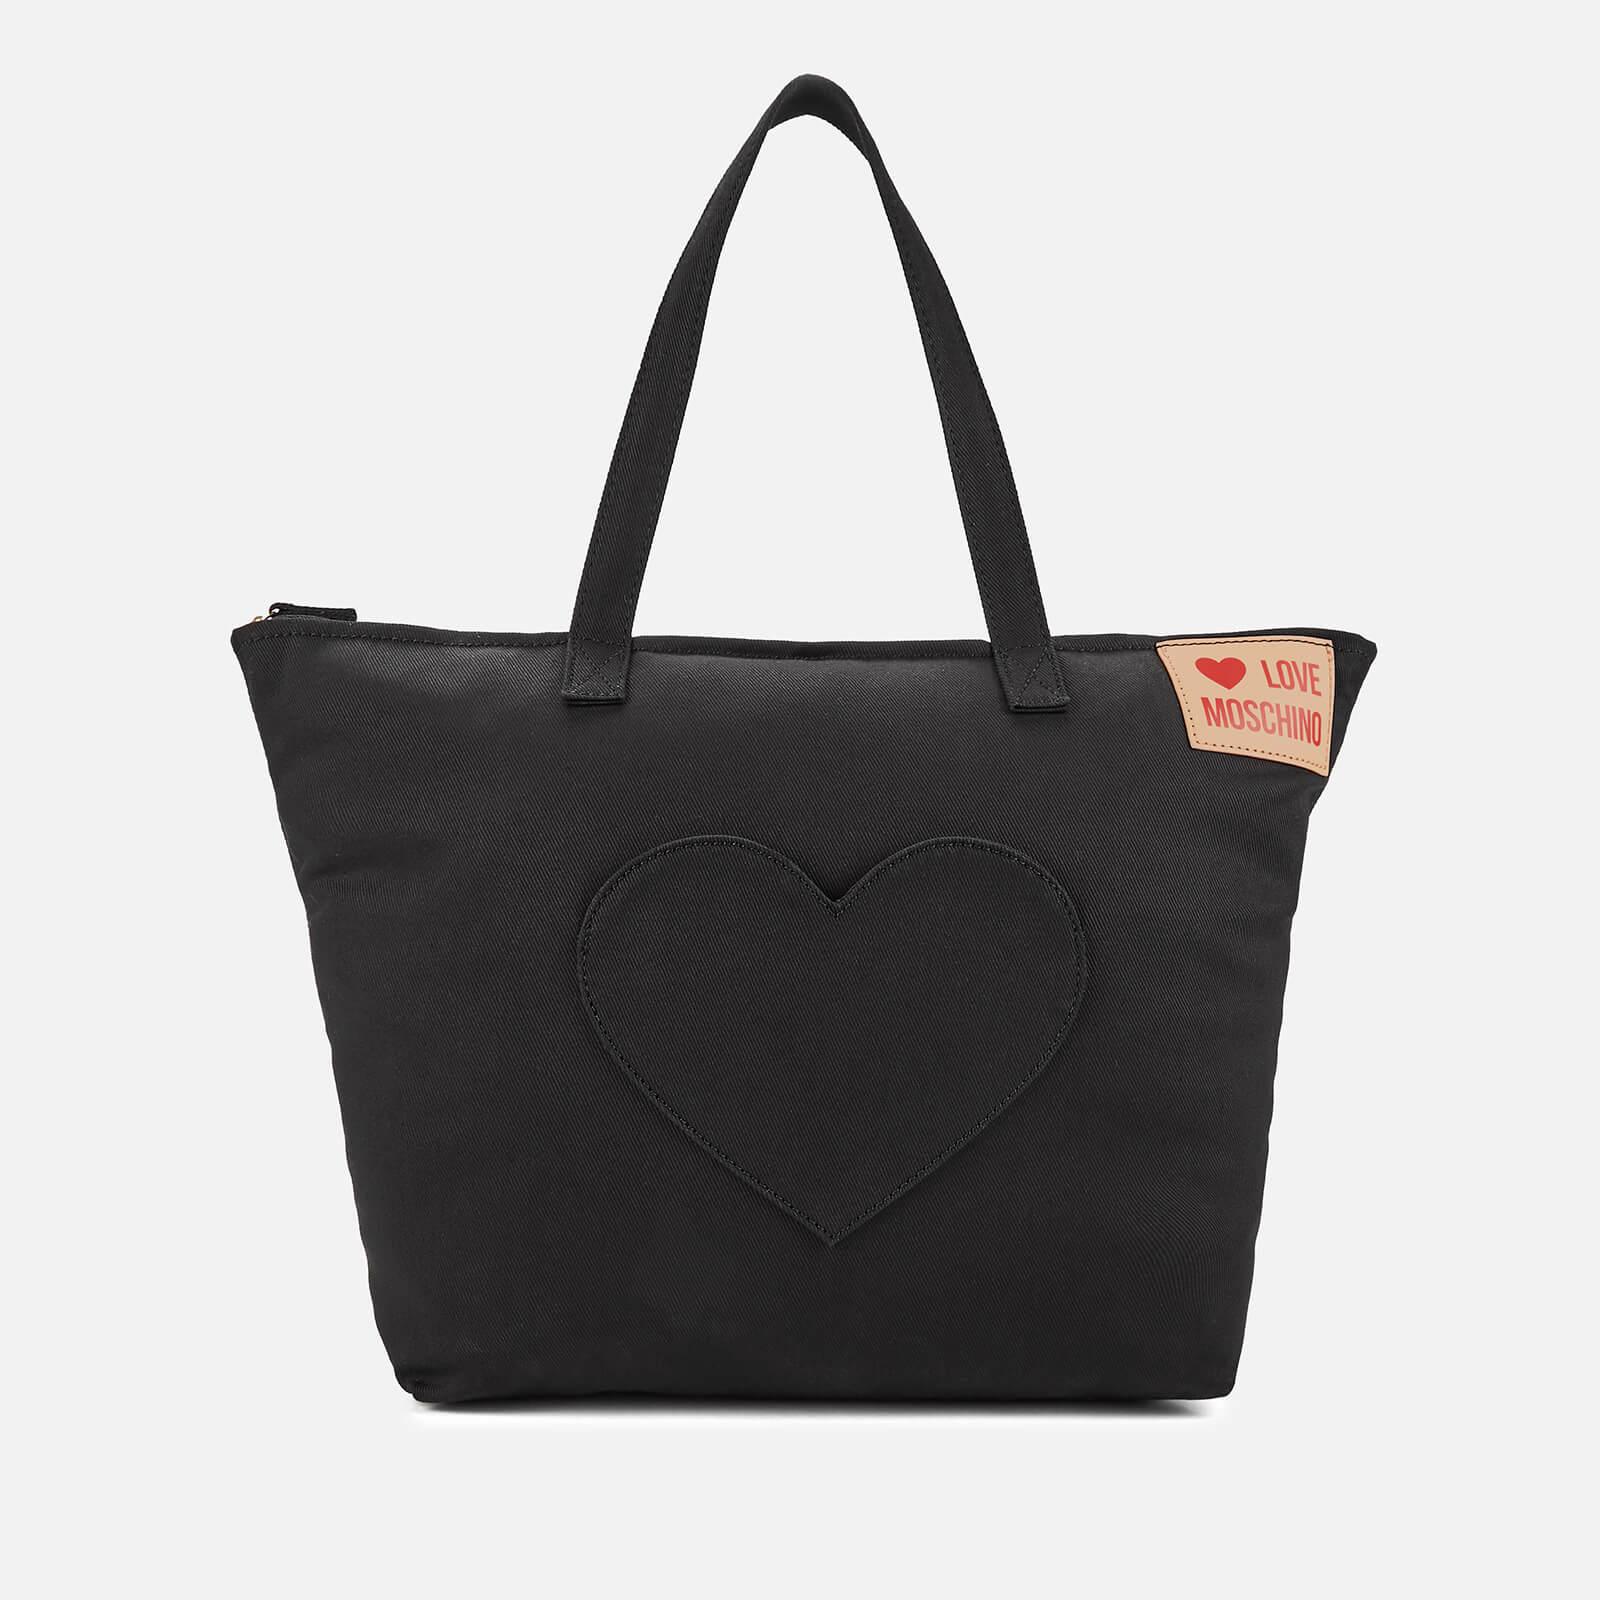 f2d65b48a88dc Love Moschino Women's Large Canvas Heart Pocket Tote Bag - Black Womens  Accessories | TheHut.com